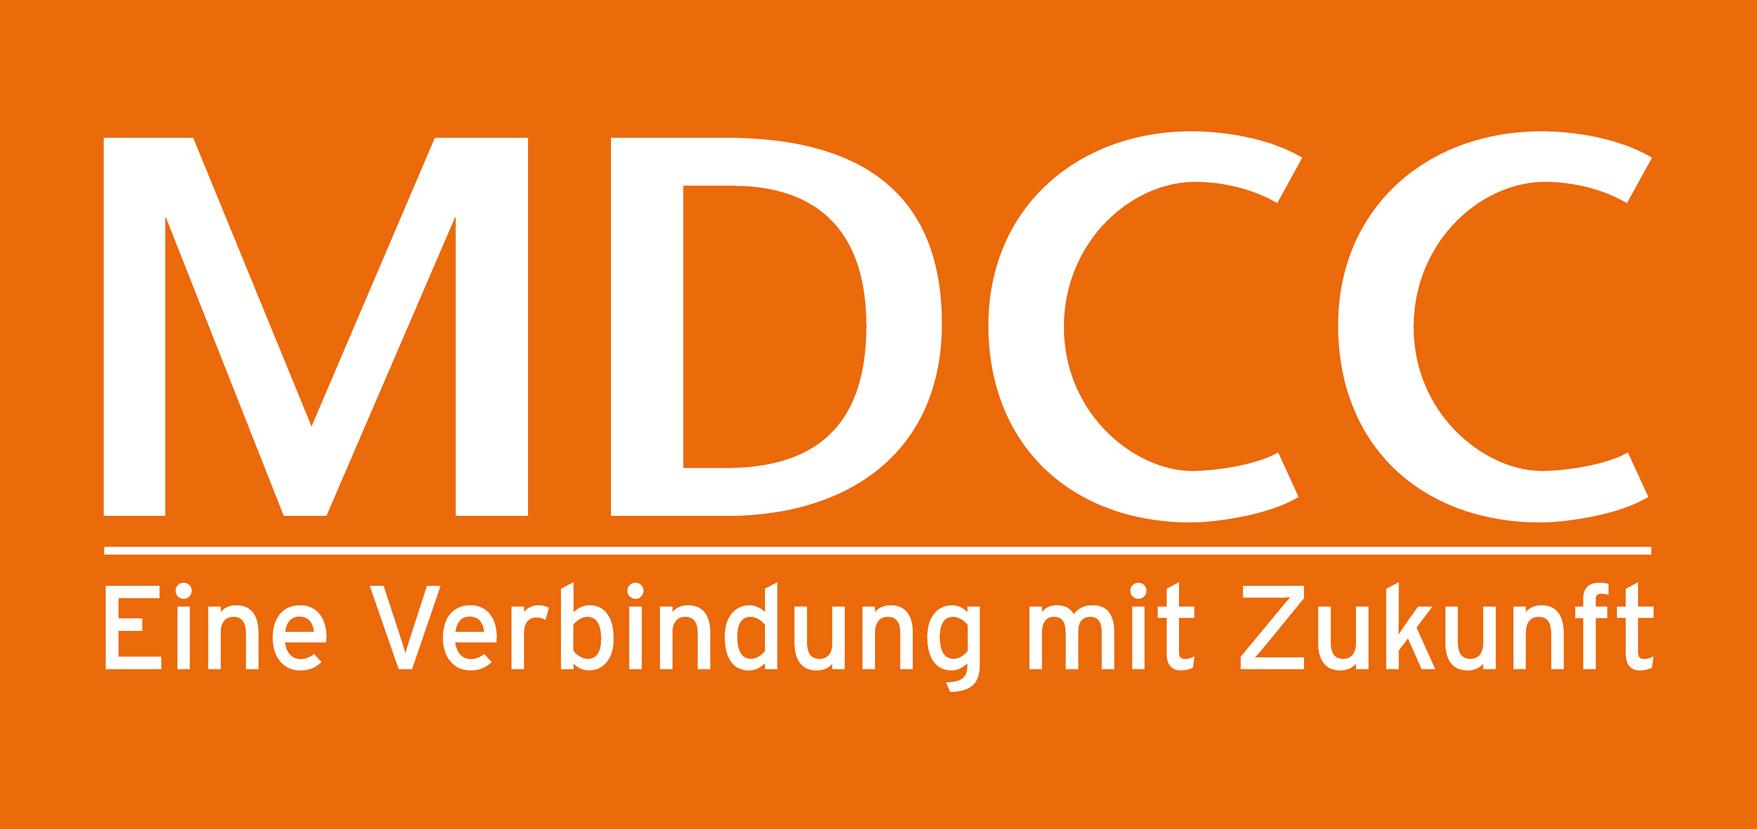 mdcc magdeburg city com gmbh archives handy dsl tarif info. Black Bedroom Furniture Sets. Home Design Ideas